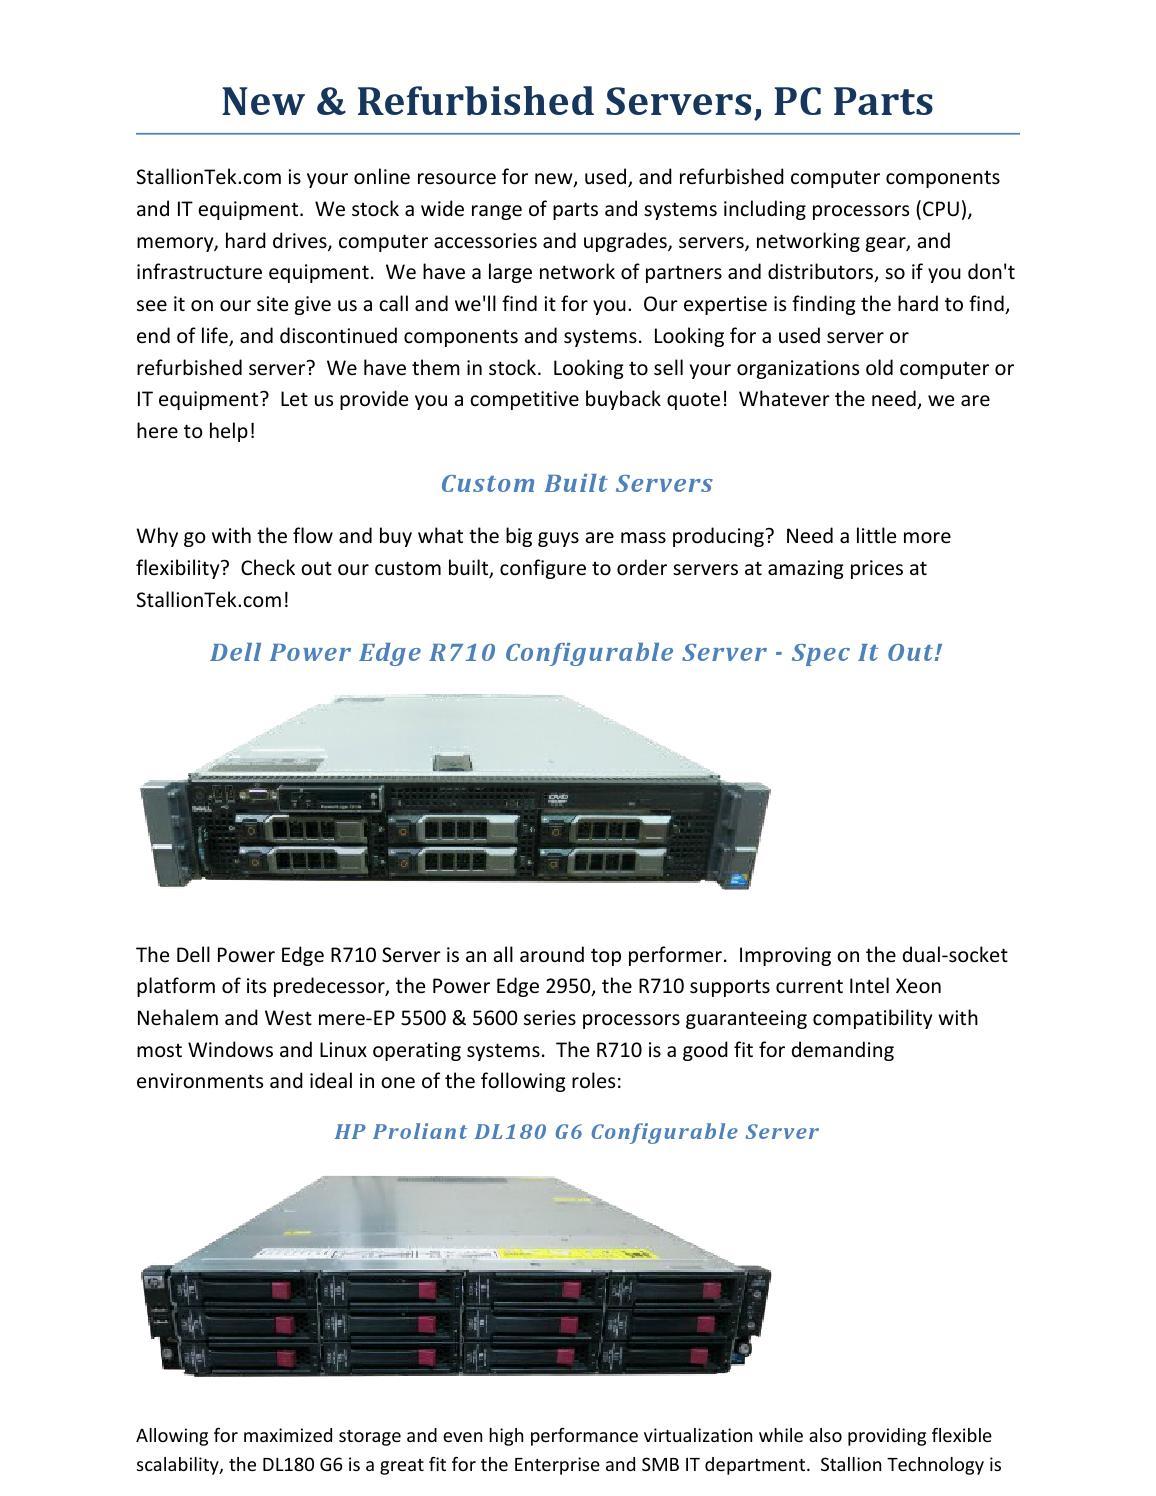 New & refurbished servers, pc parts by stalliontek - issuu